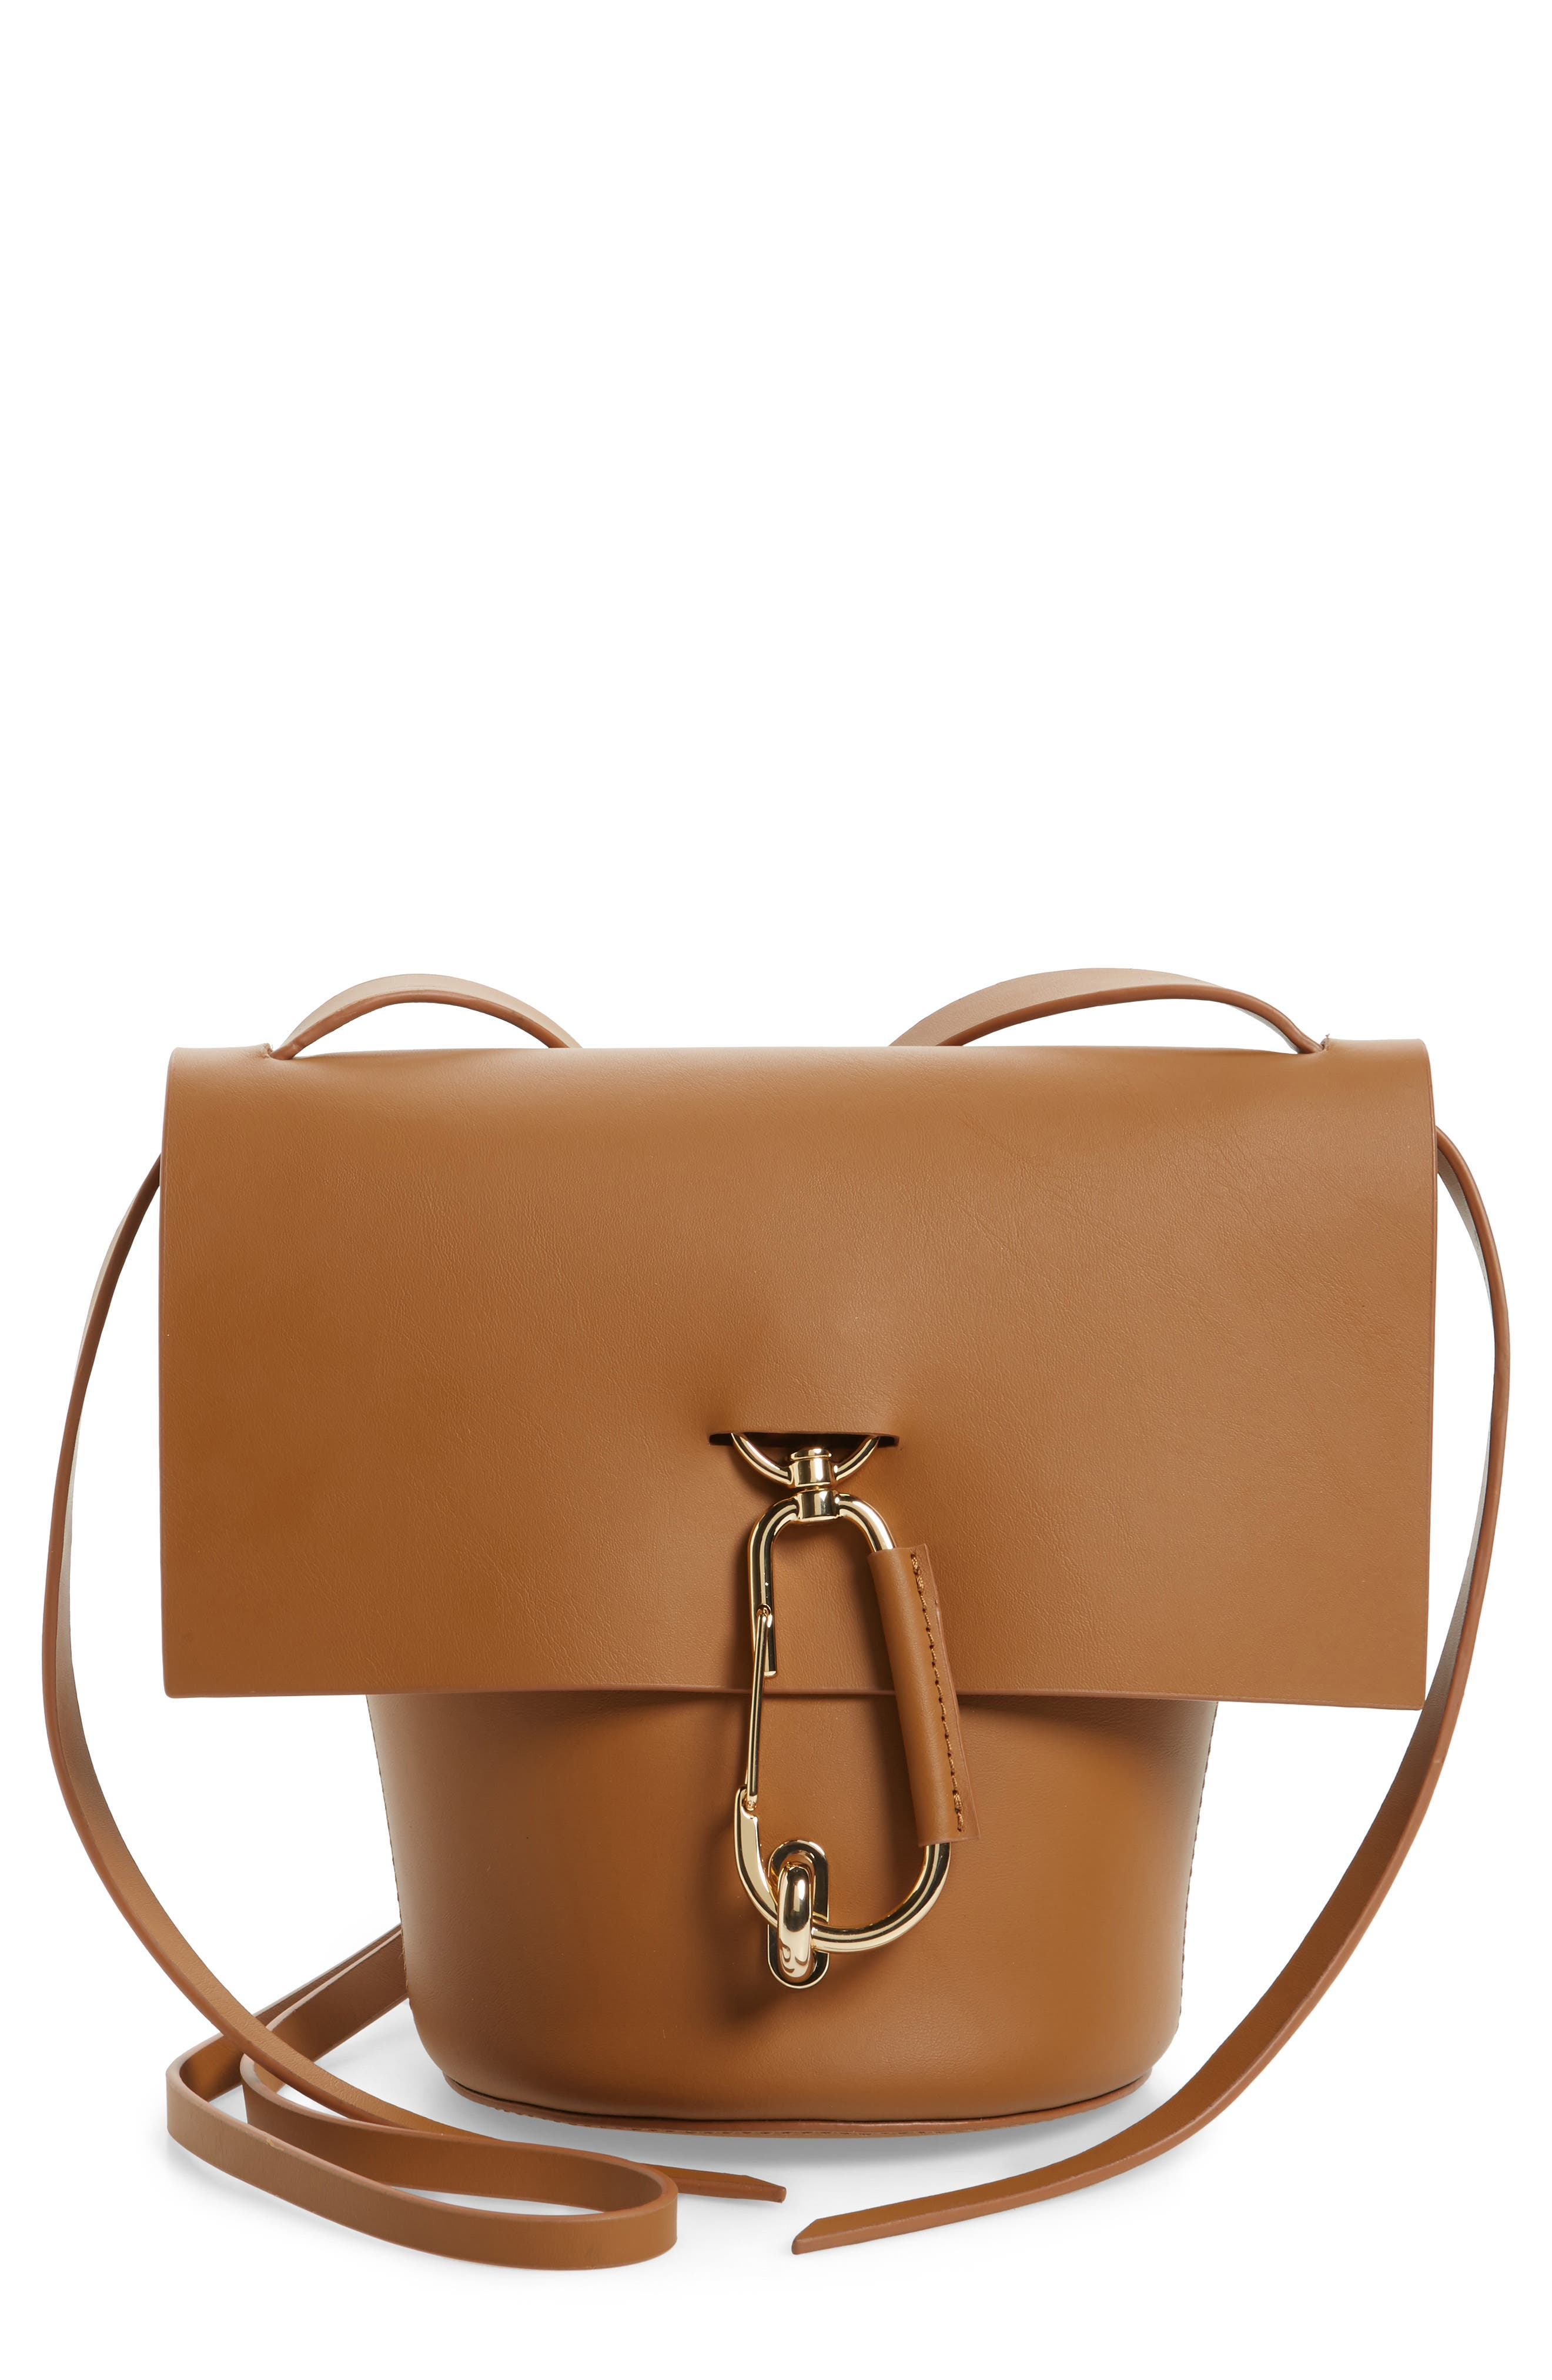 Alternate Image 1 Selected - ZAC Zac Posen Belay Leather Crossbody Bag